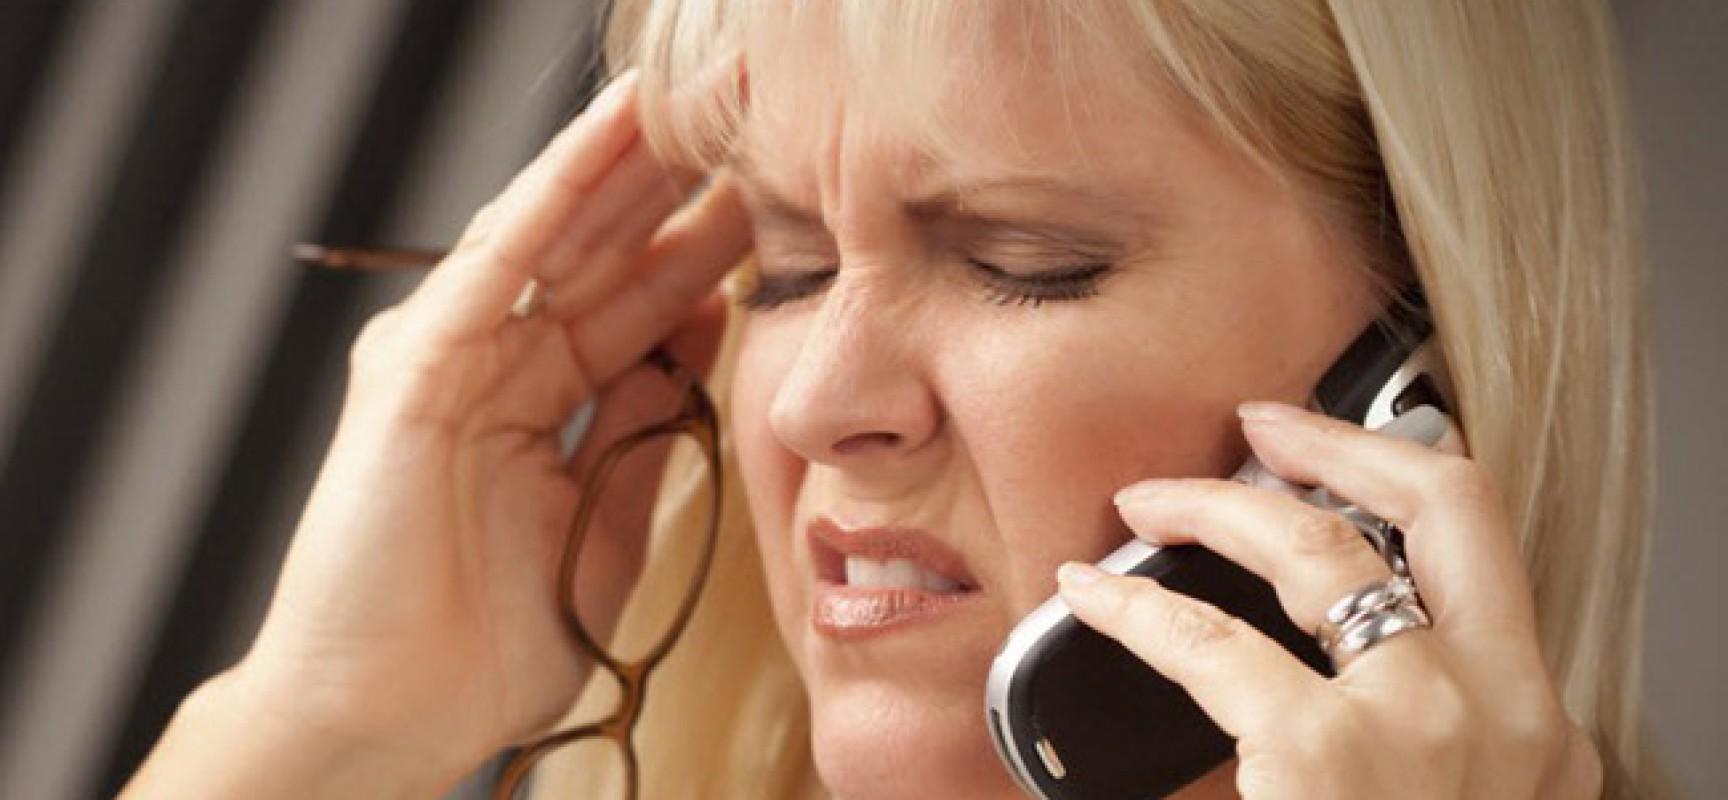 интимного разговора телефон